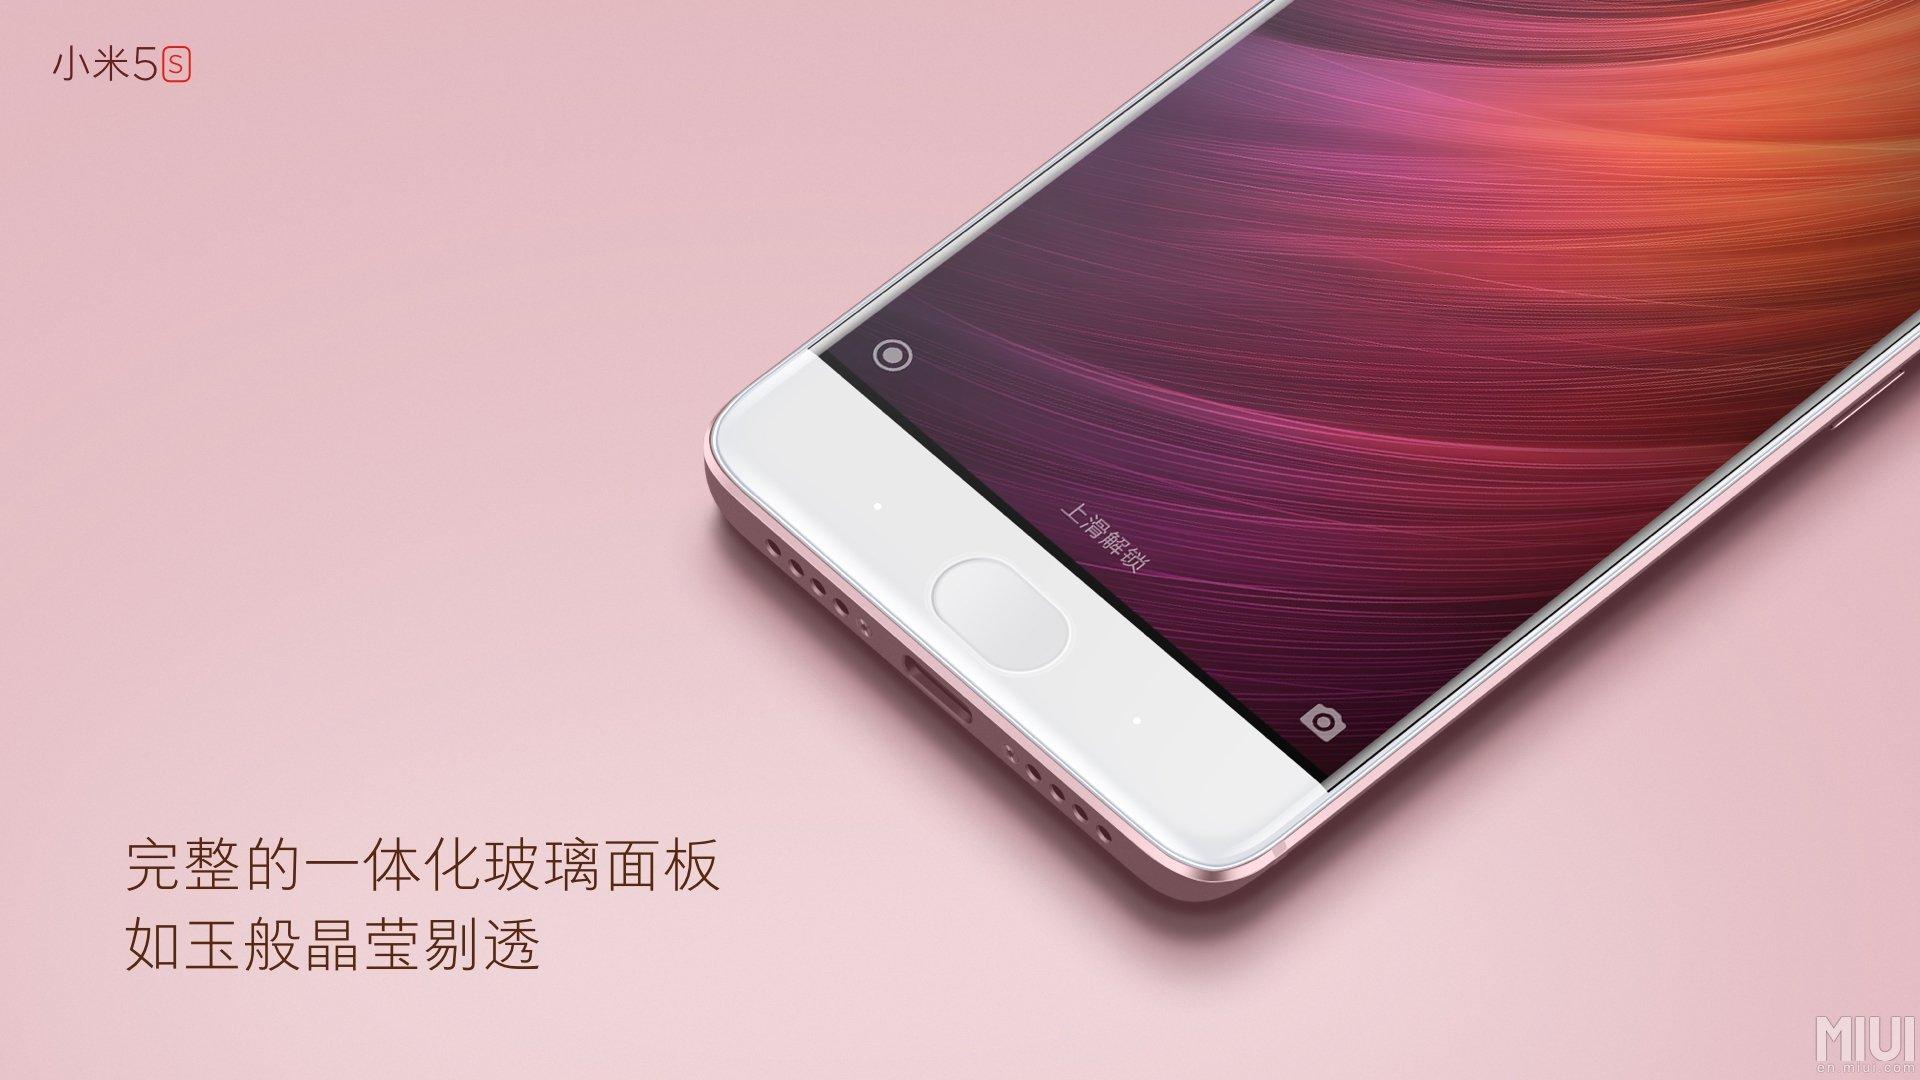 Xiaomi mi 5s lettore impronte